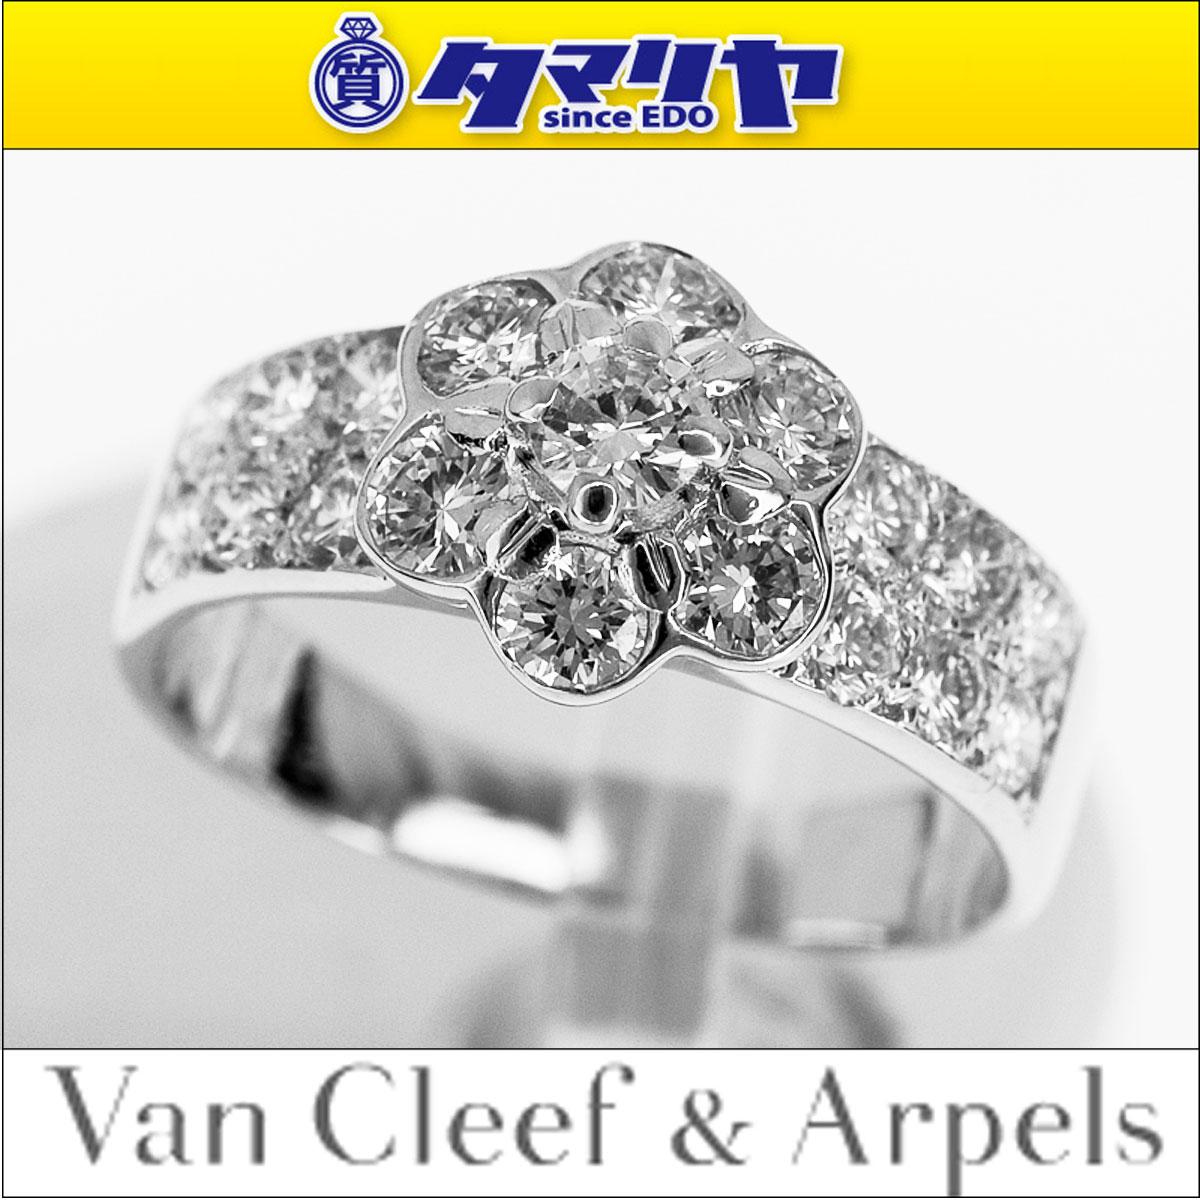 Van Cleef&Arpels ヴァンクリーフ&アーペル マデール ダイヤ(D0.98ct) リング 750 K18 WG ホワイトゴールド 日本サイズ約9号 #49【送料無料】【代引き手数料無料】レディース【中古】29861101